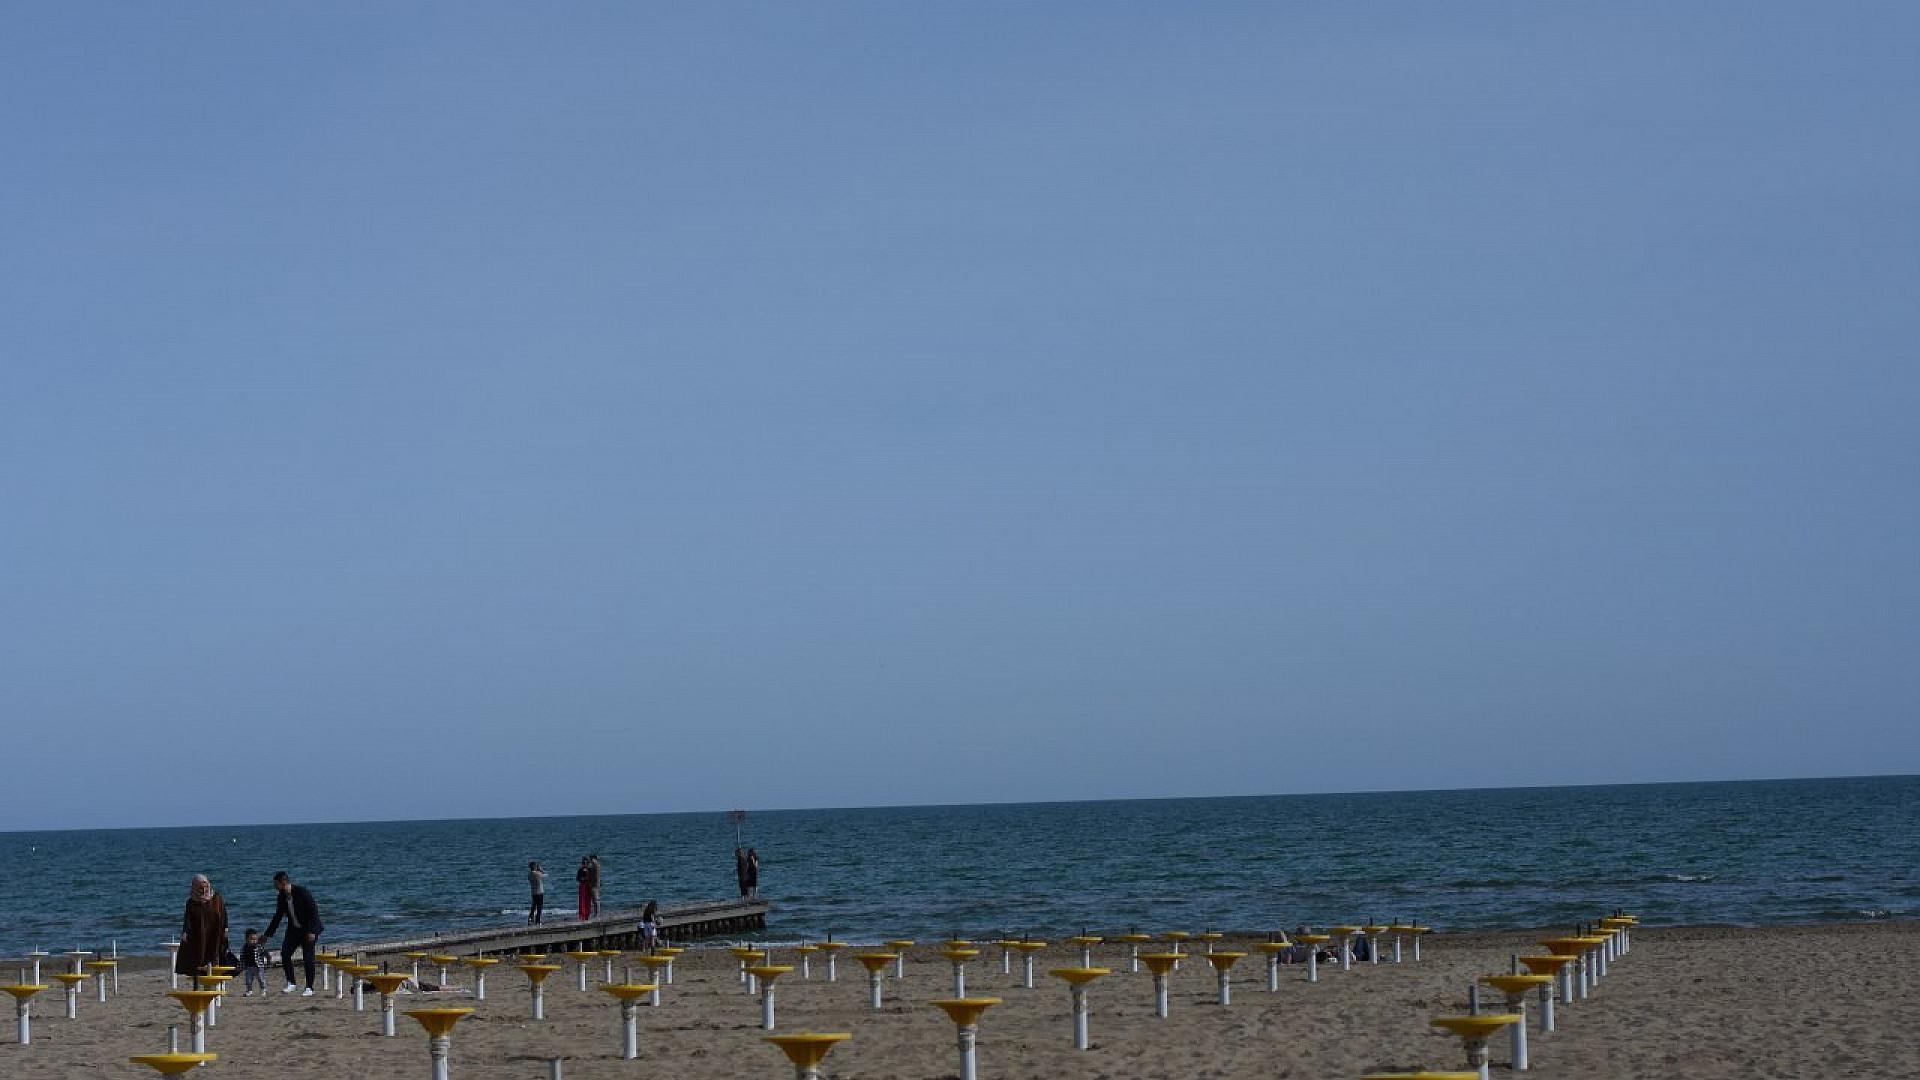 Spiaggia Capannina